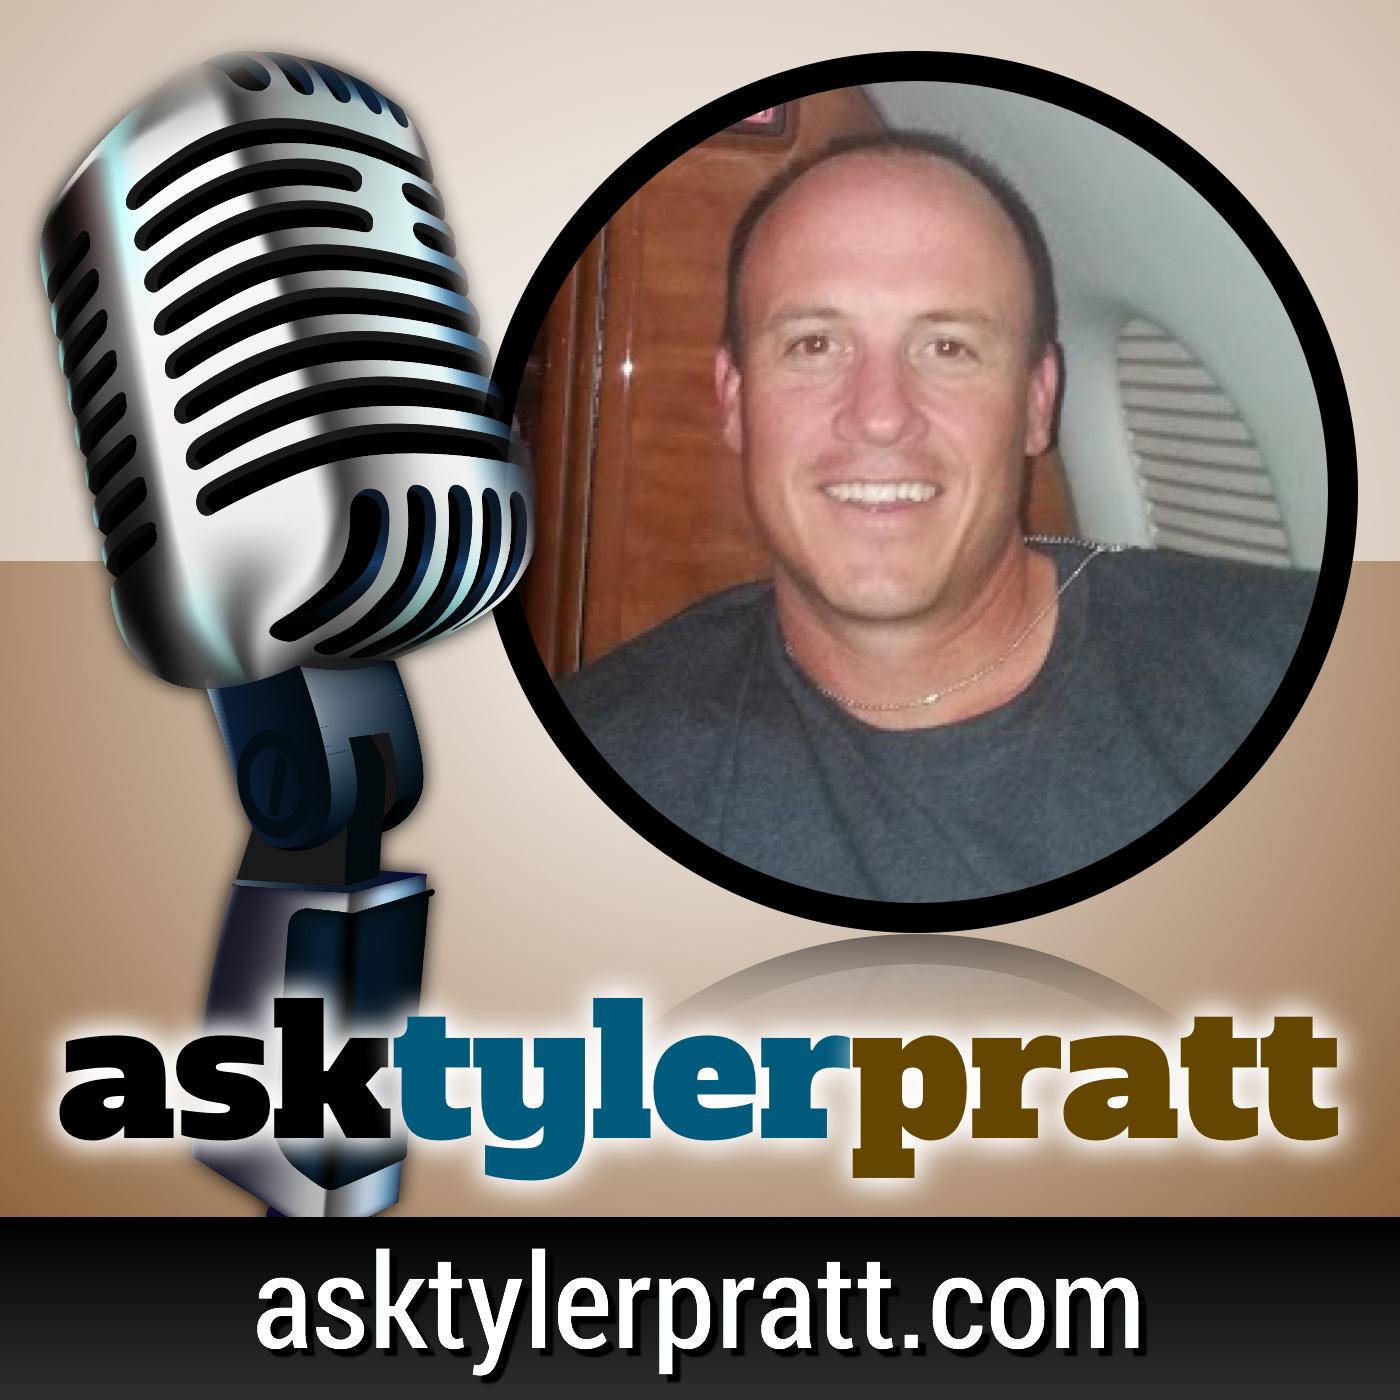 AskTylerPratt's Marketing Show